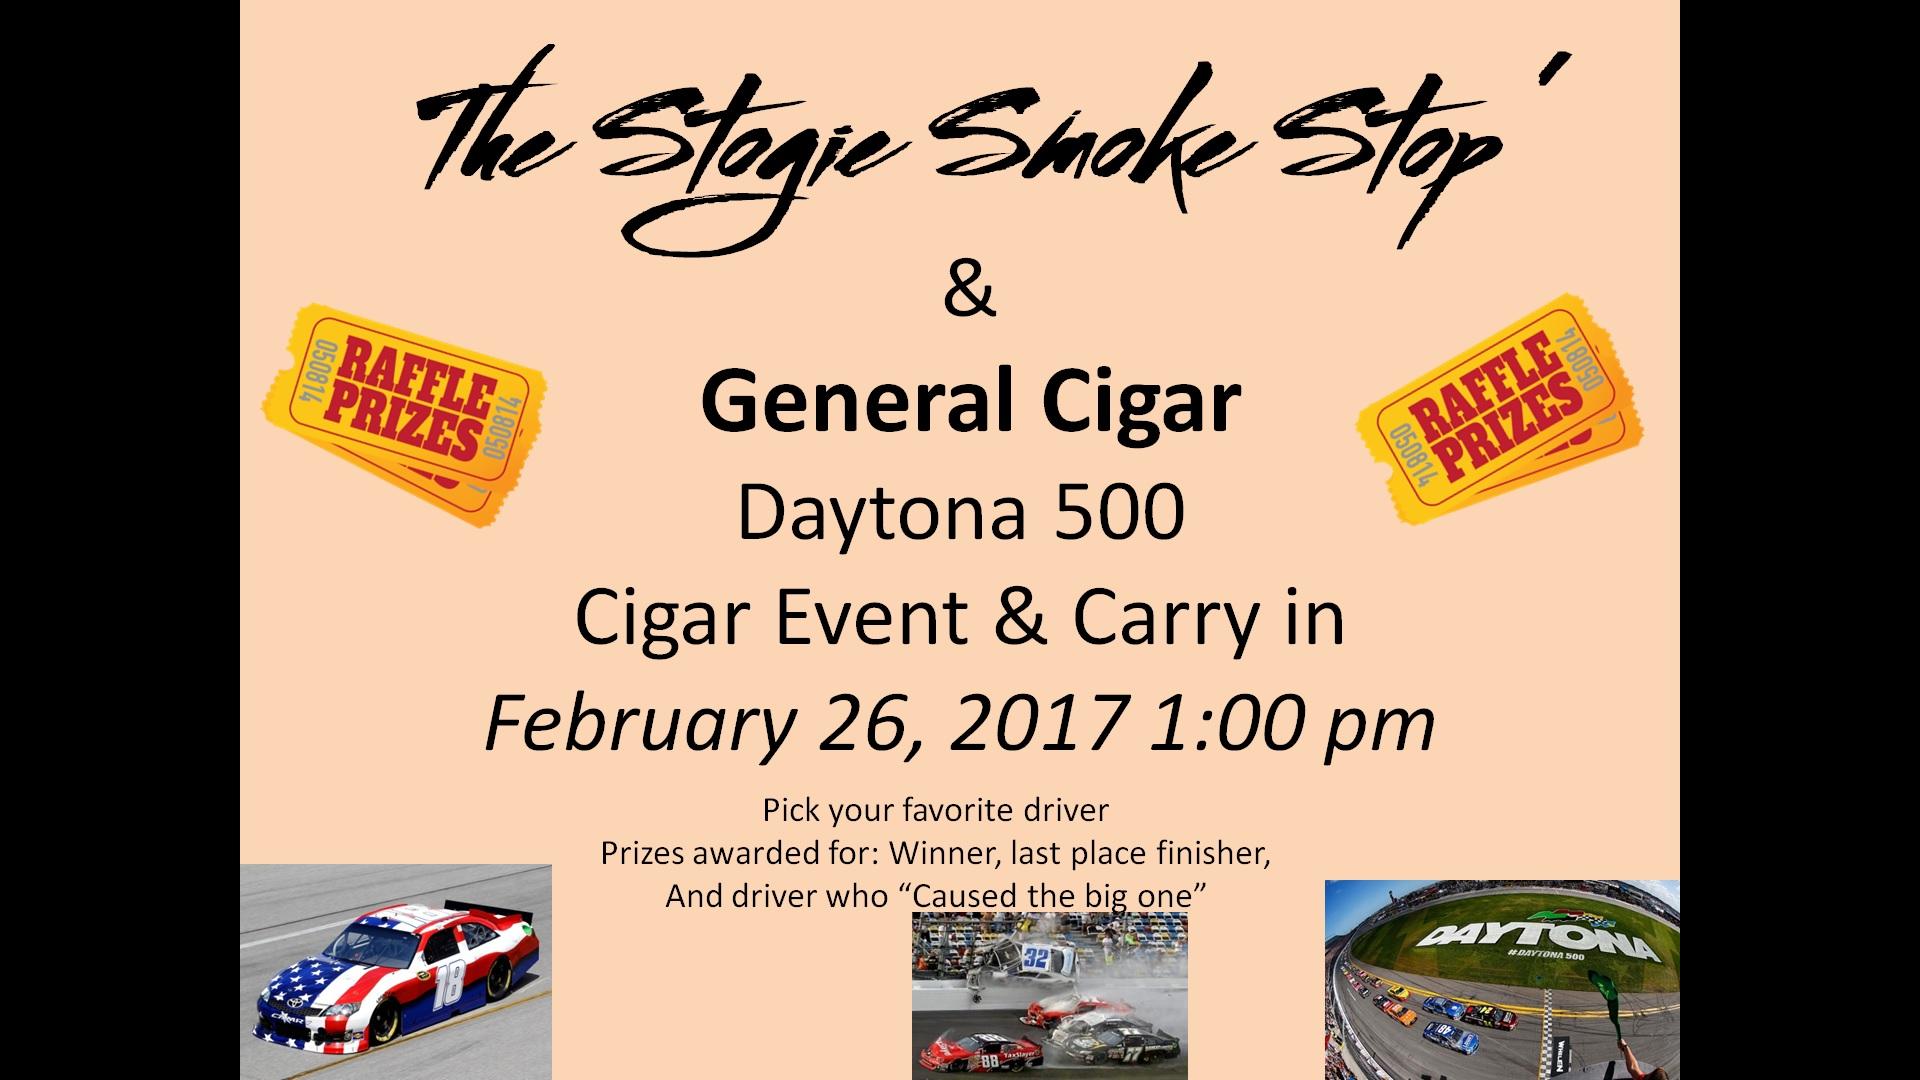 Daytona 500 event.jpg